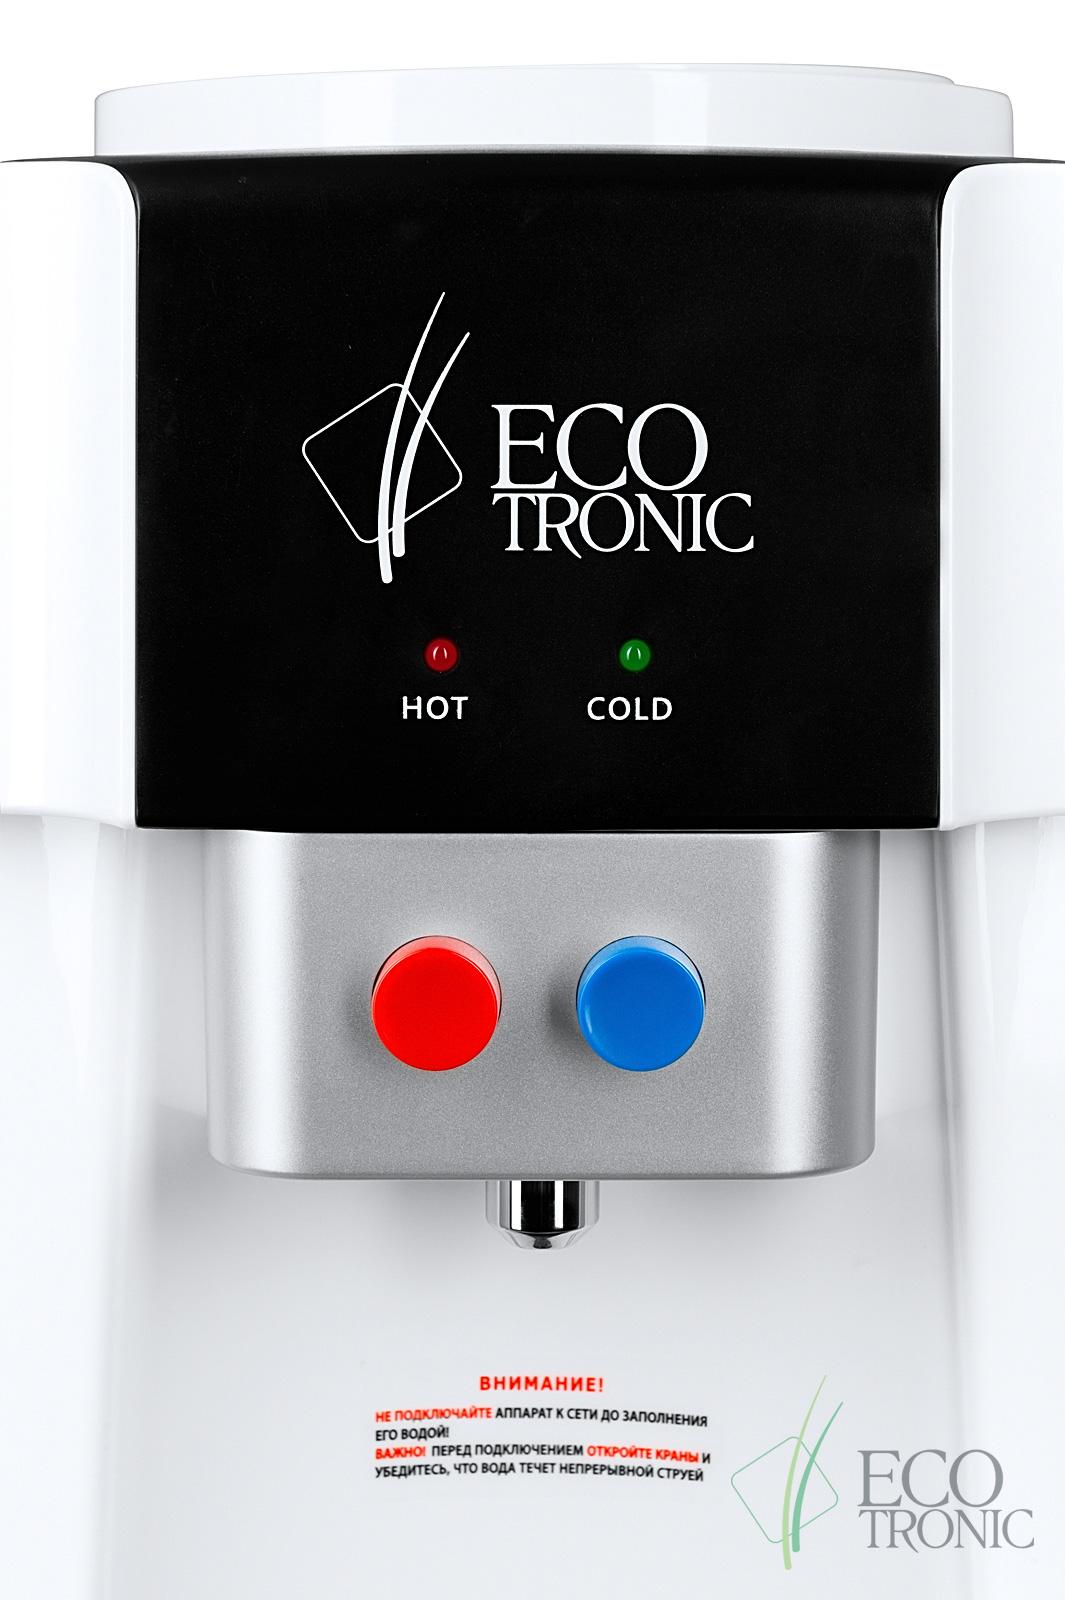 Кулер Ecotronic A1-TE нагрев и охлаждение